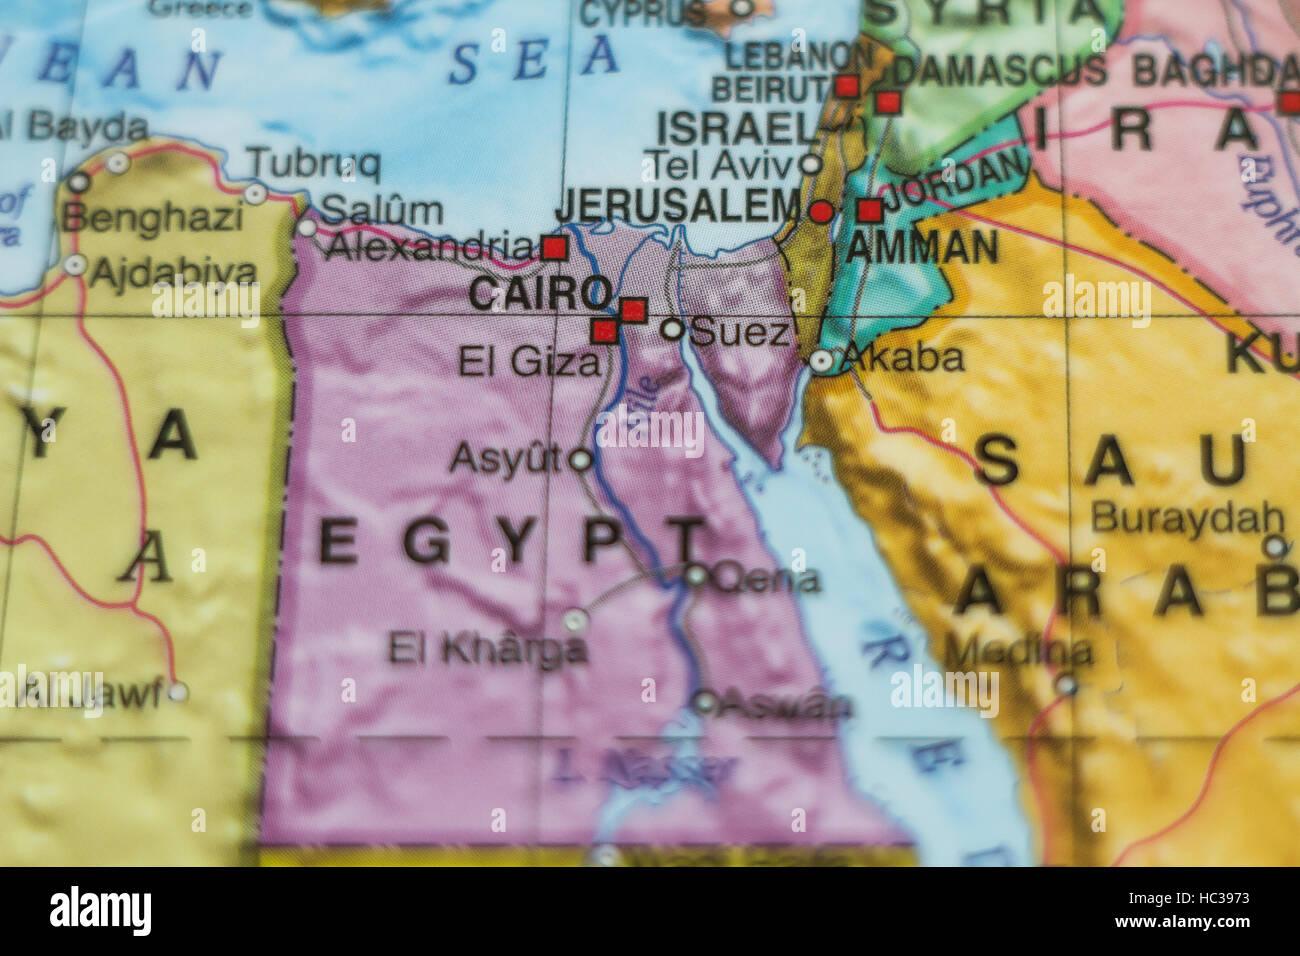 Photo of a map of Arab Republic of Egypt and the capital ... on tyre map, beirut on a map, sanaa map, persia map, jordan map, constantinople map, aleppo map, euphrates river map, medina map, syria map, canaan map, mecca map, ankara map, sinai peninsula map, iraq map, muscat map, amman map, jerusalem map, libya map, belgrade map,